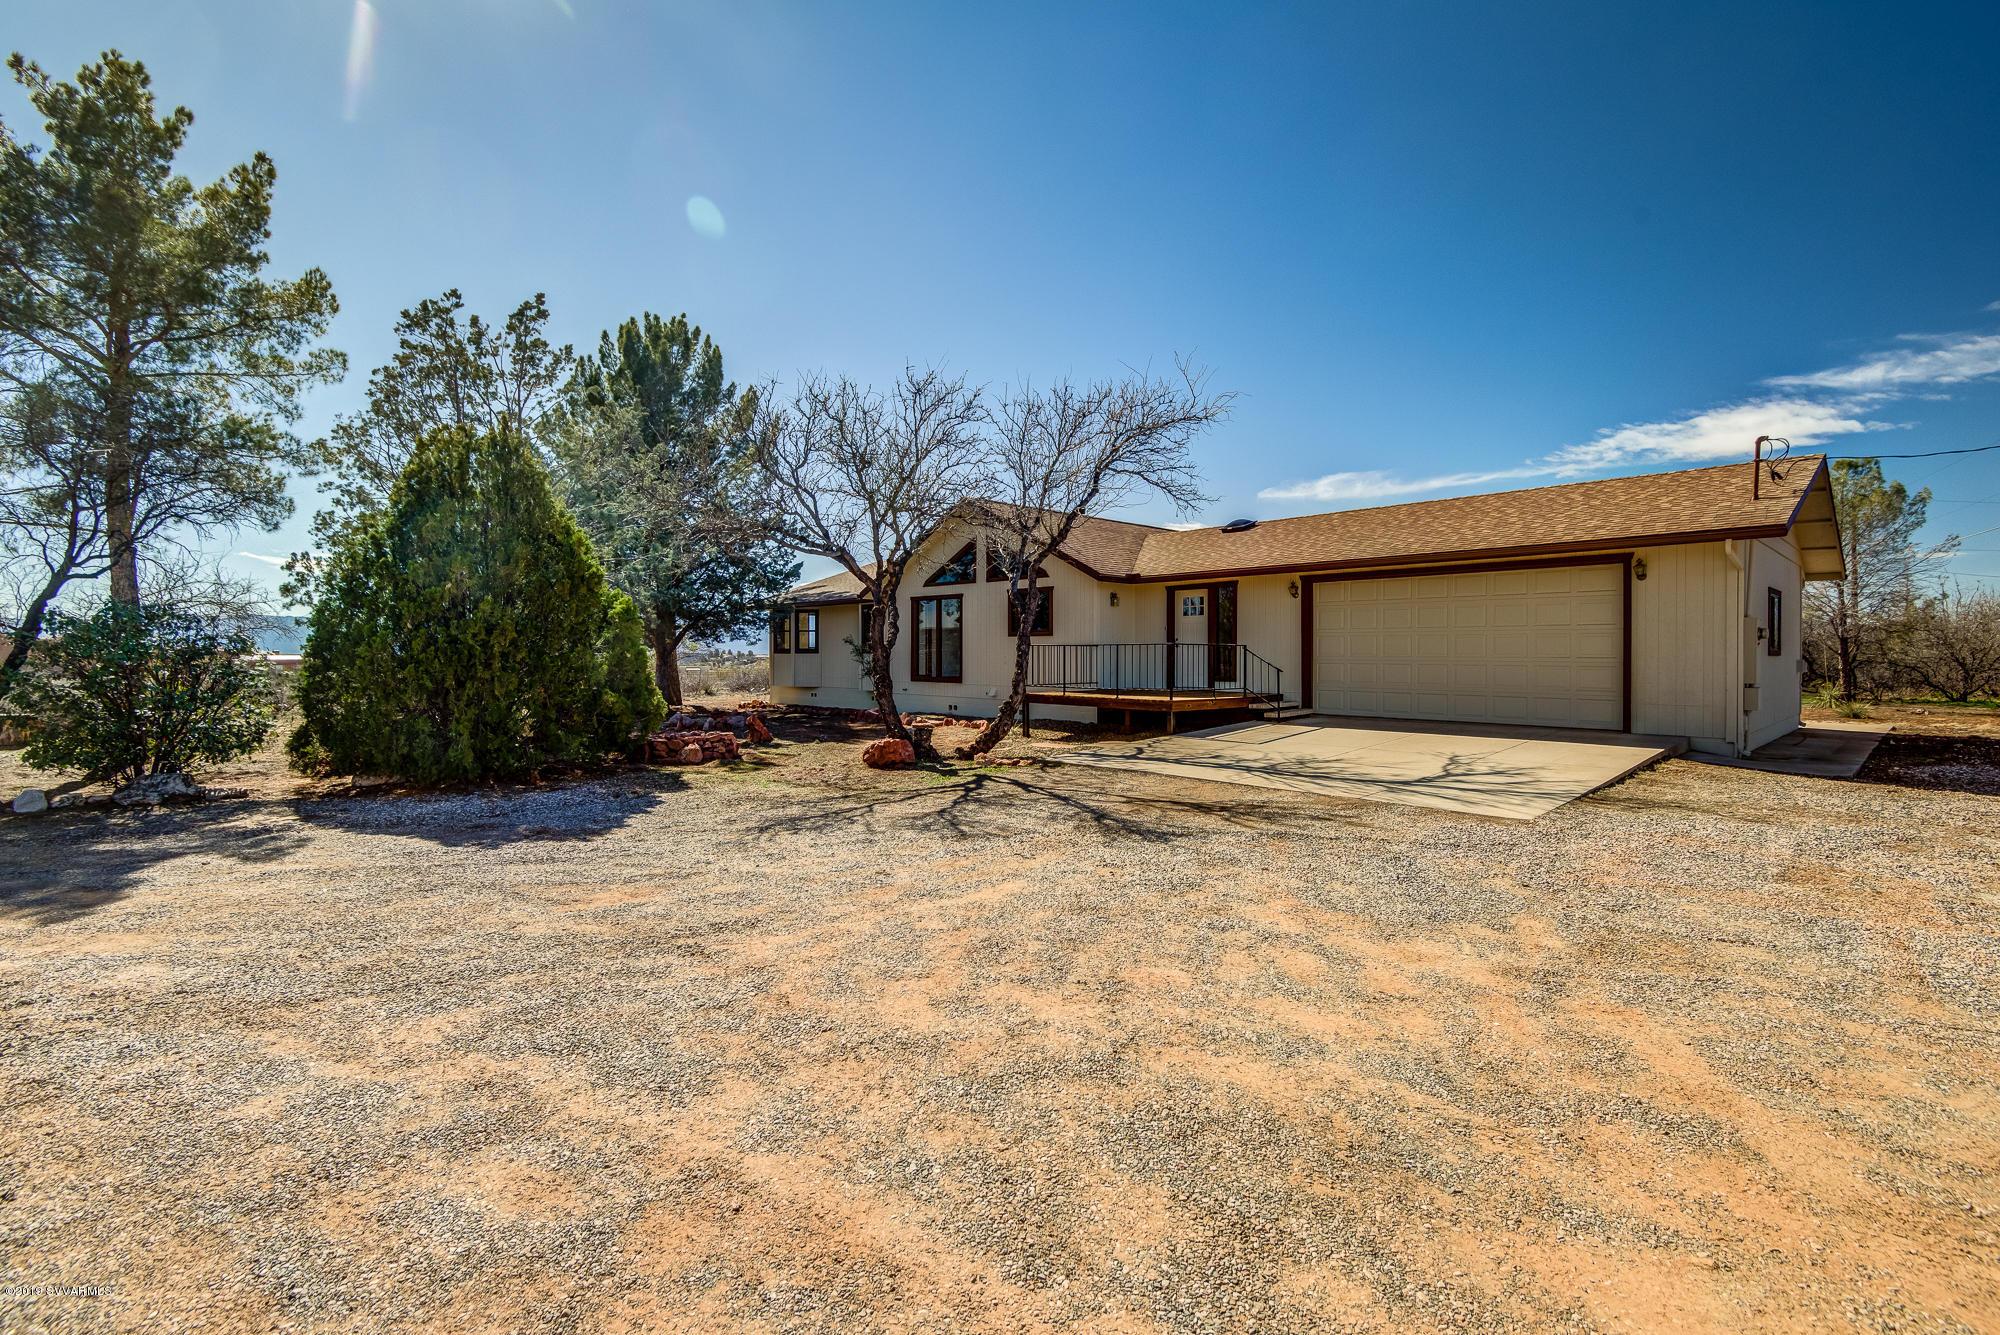 12457 E Cornville Rd Cornville, AZ 86325